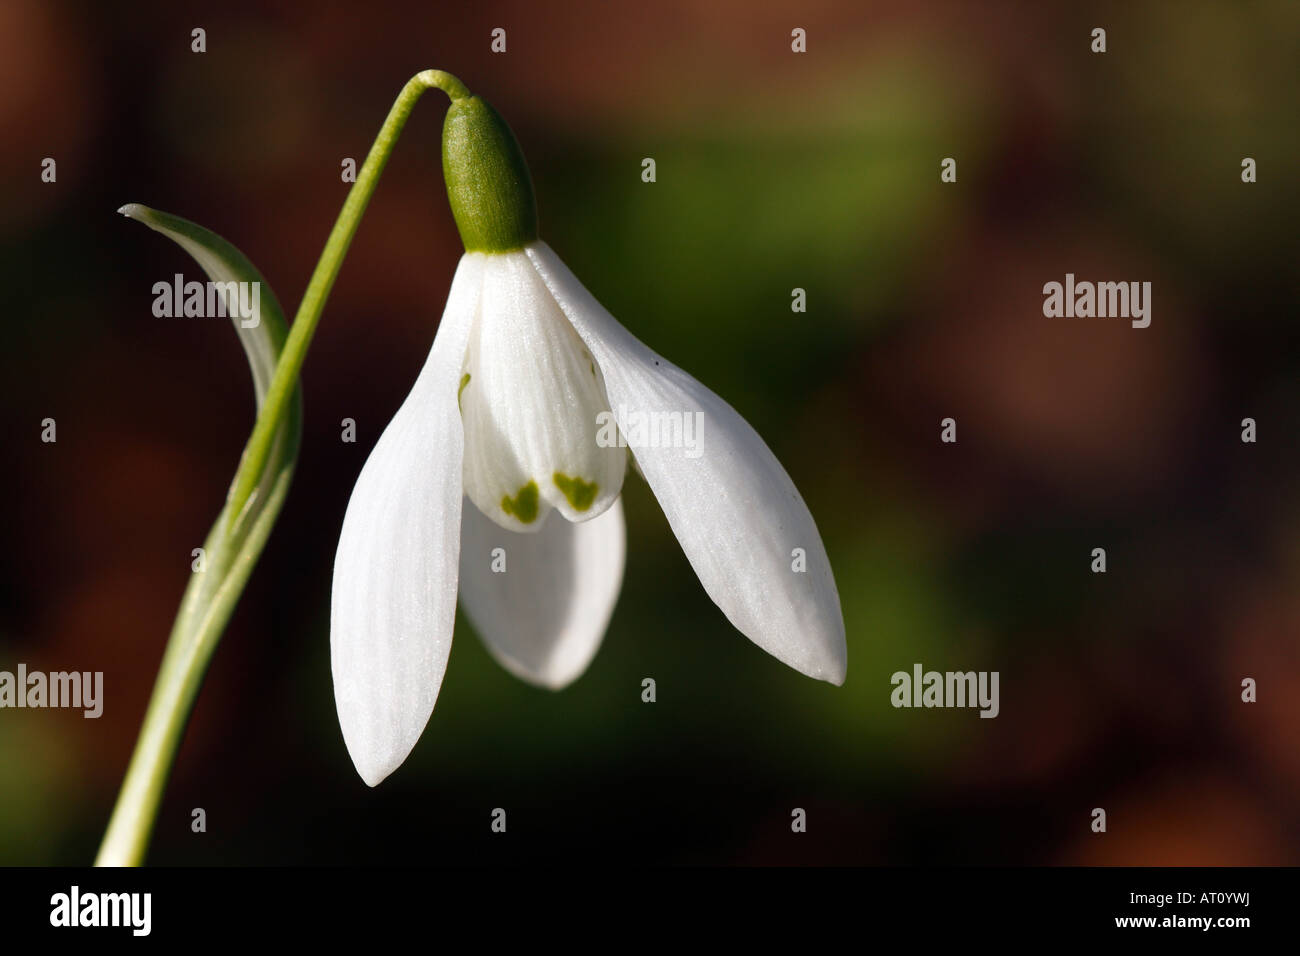 Snowdrop [Galanthus nivalis], 'close up' flower macro showing petal detail, [Welford Park], England, UK - Stock Image